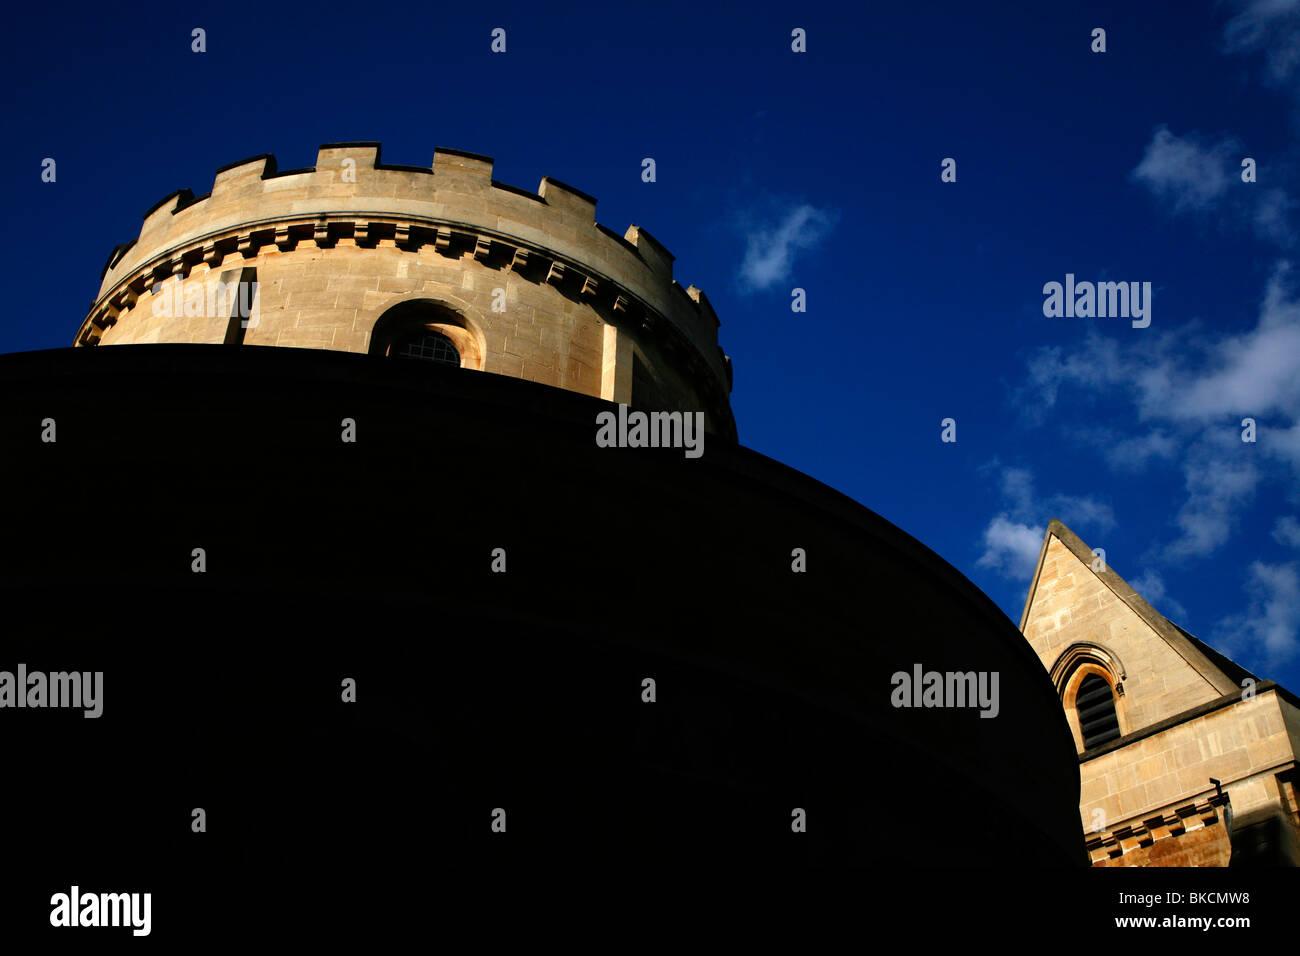 Temple Church, Inner Temple, Inns of Court, London, UK - Stock Image